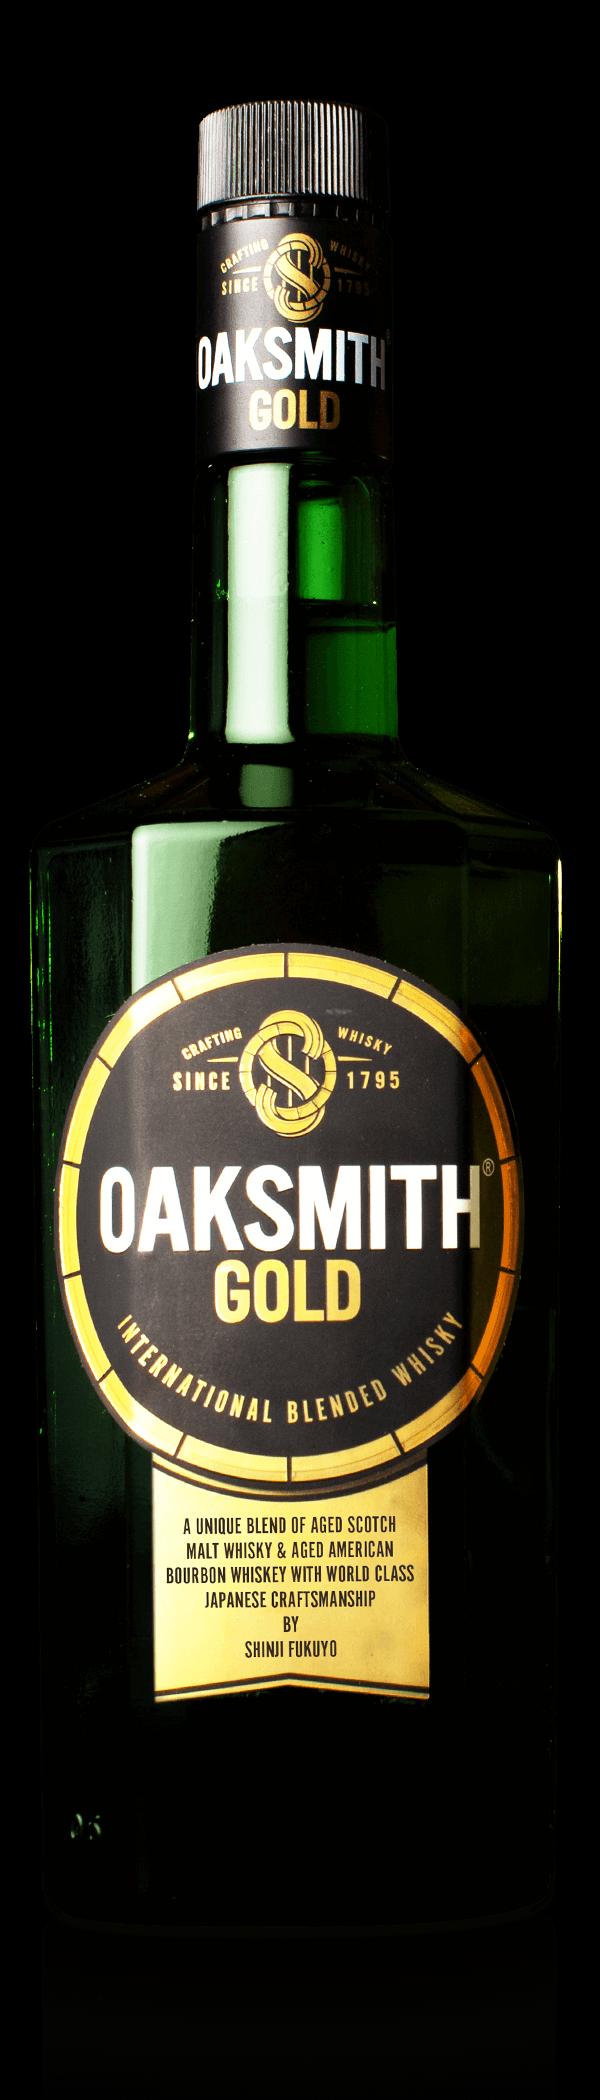 oaksmith gold japanese craftmanship banner